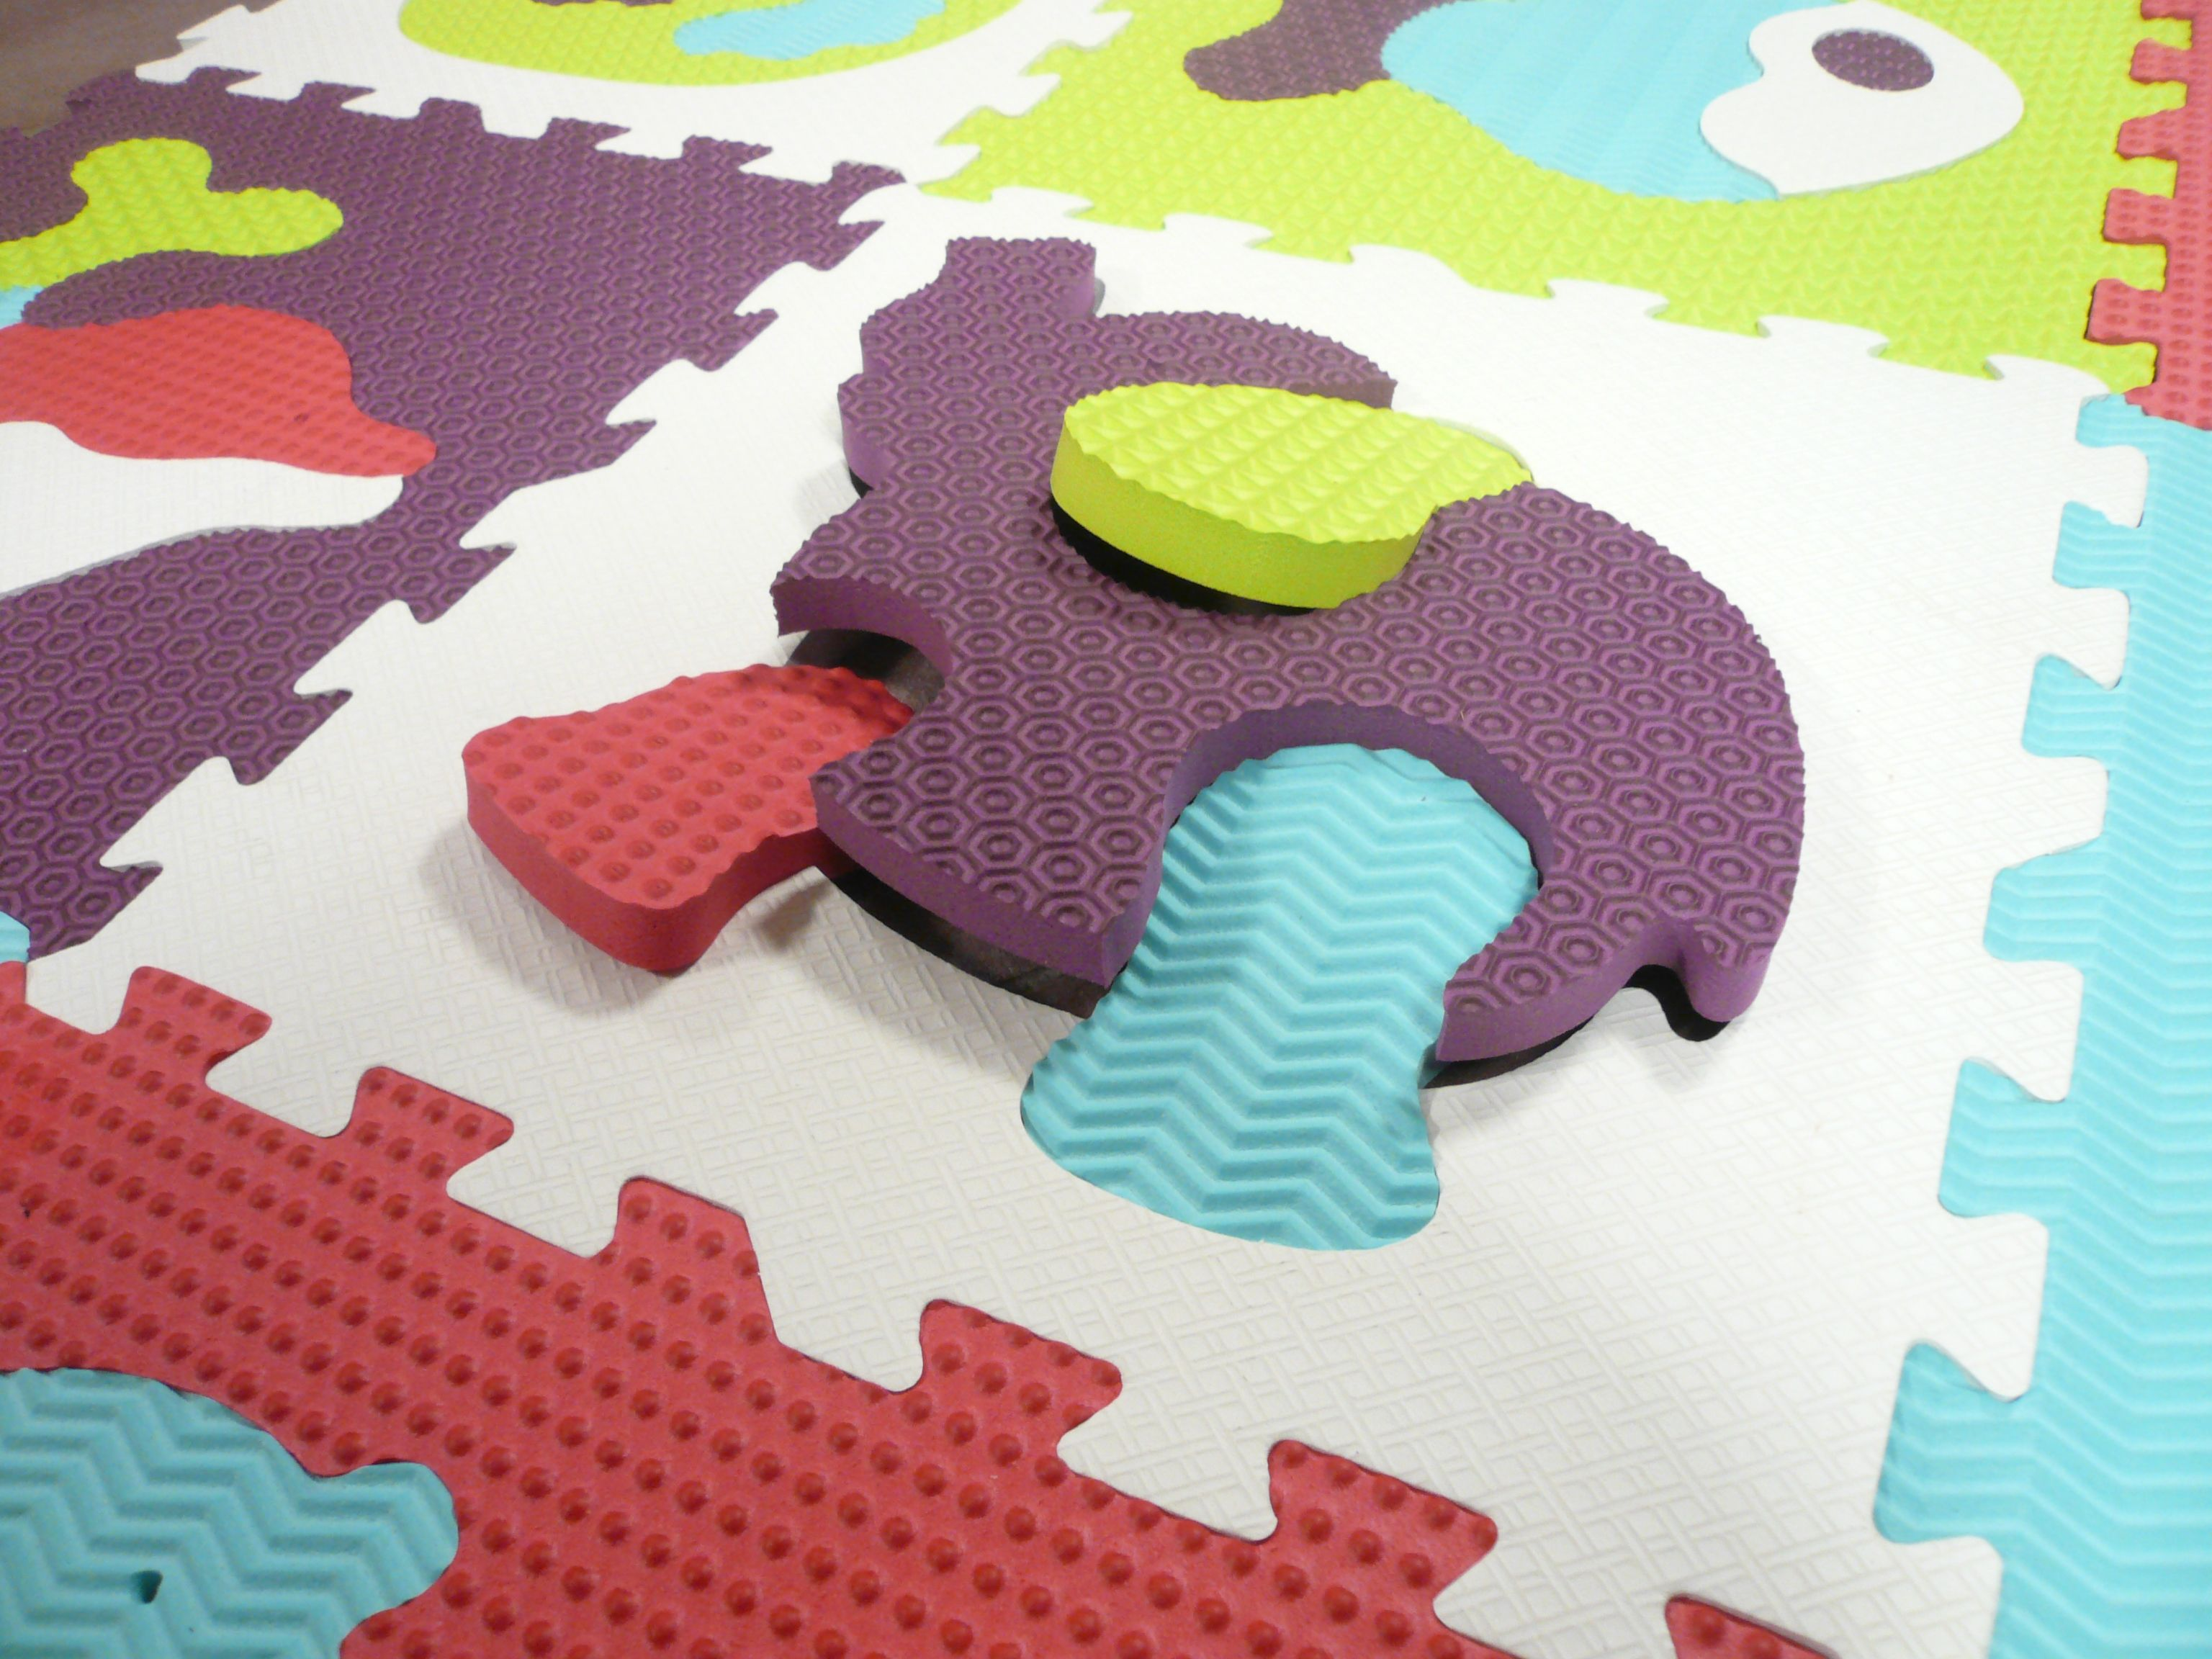 dalles animaux dallesmousse tapis mousse imagination. Black Bedroom Furniture Sets. Home Design Ideas